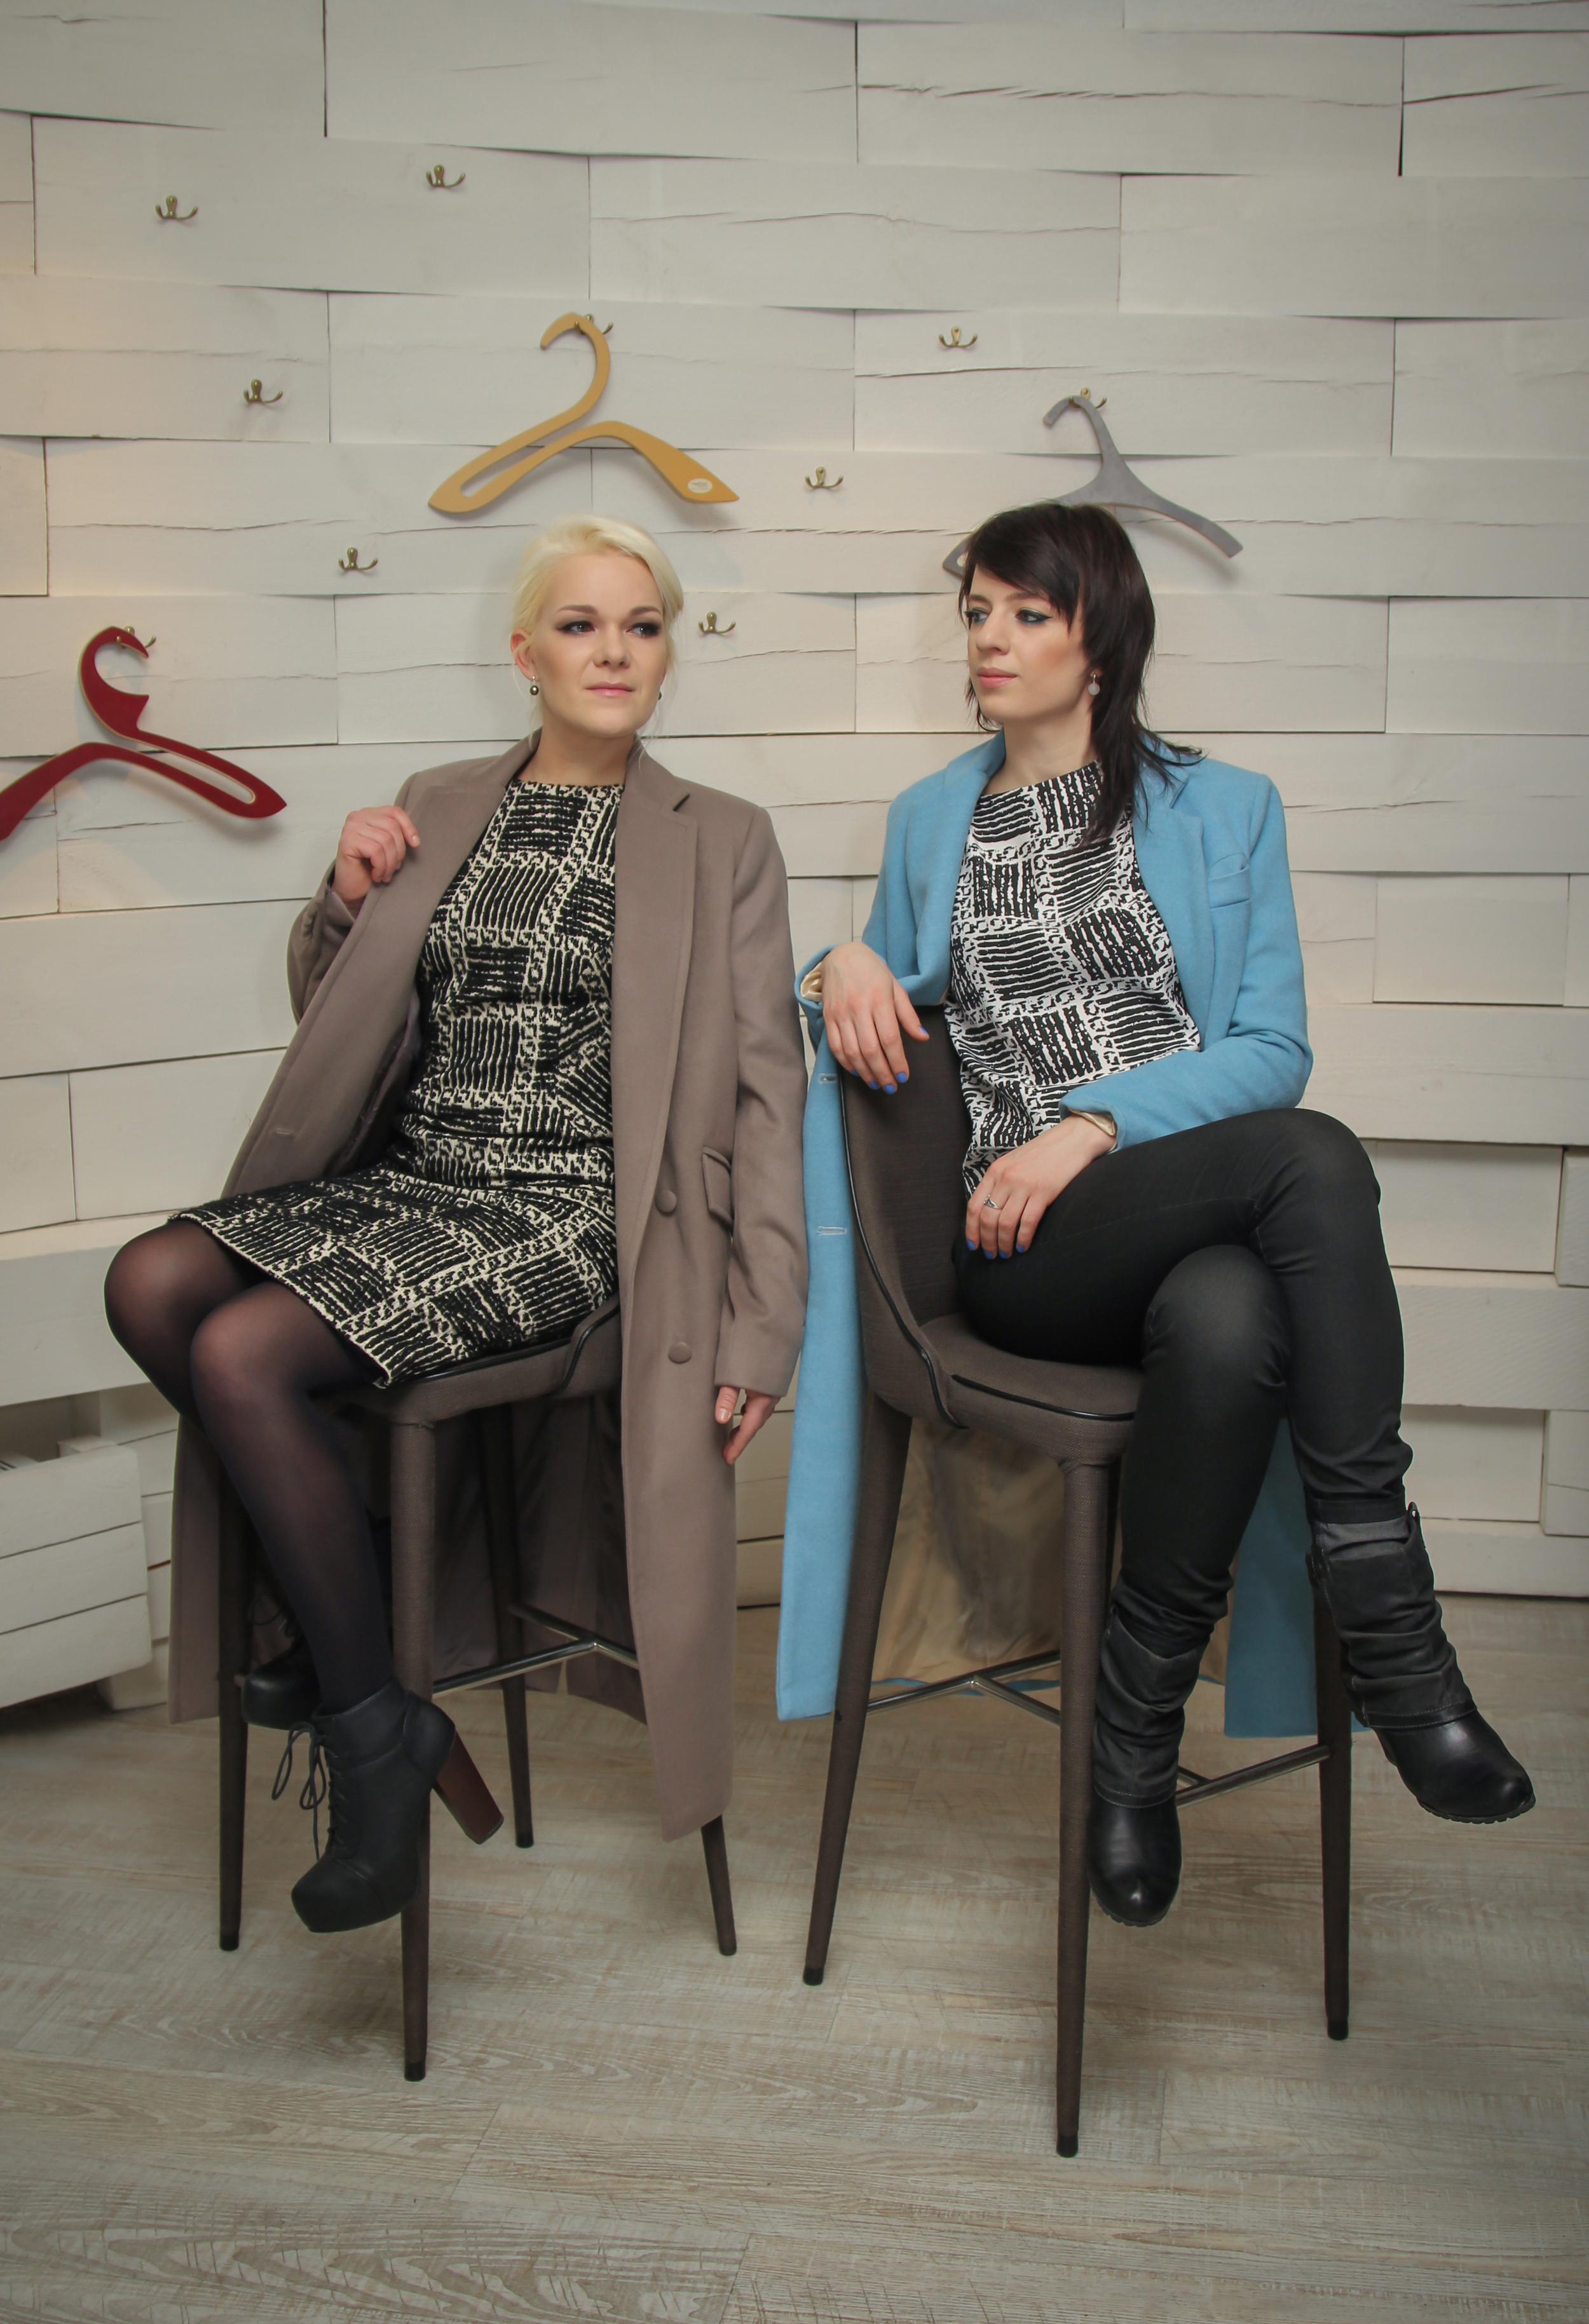 Dress and blouse: Uschanka